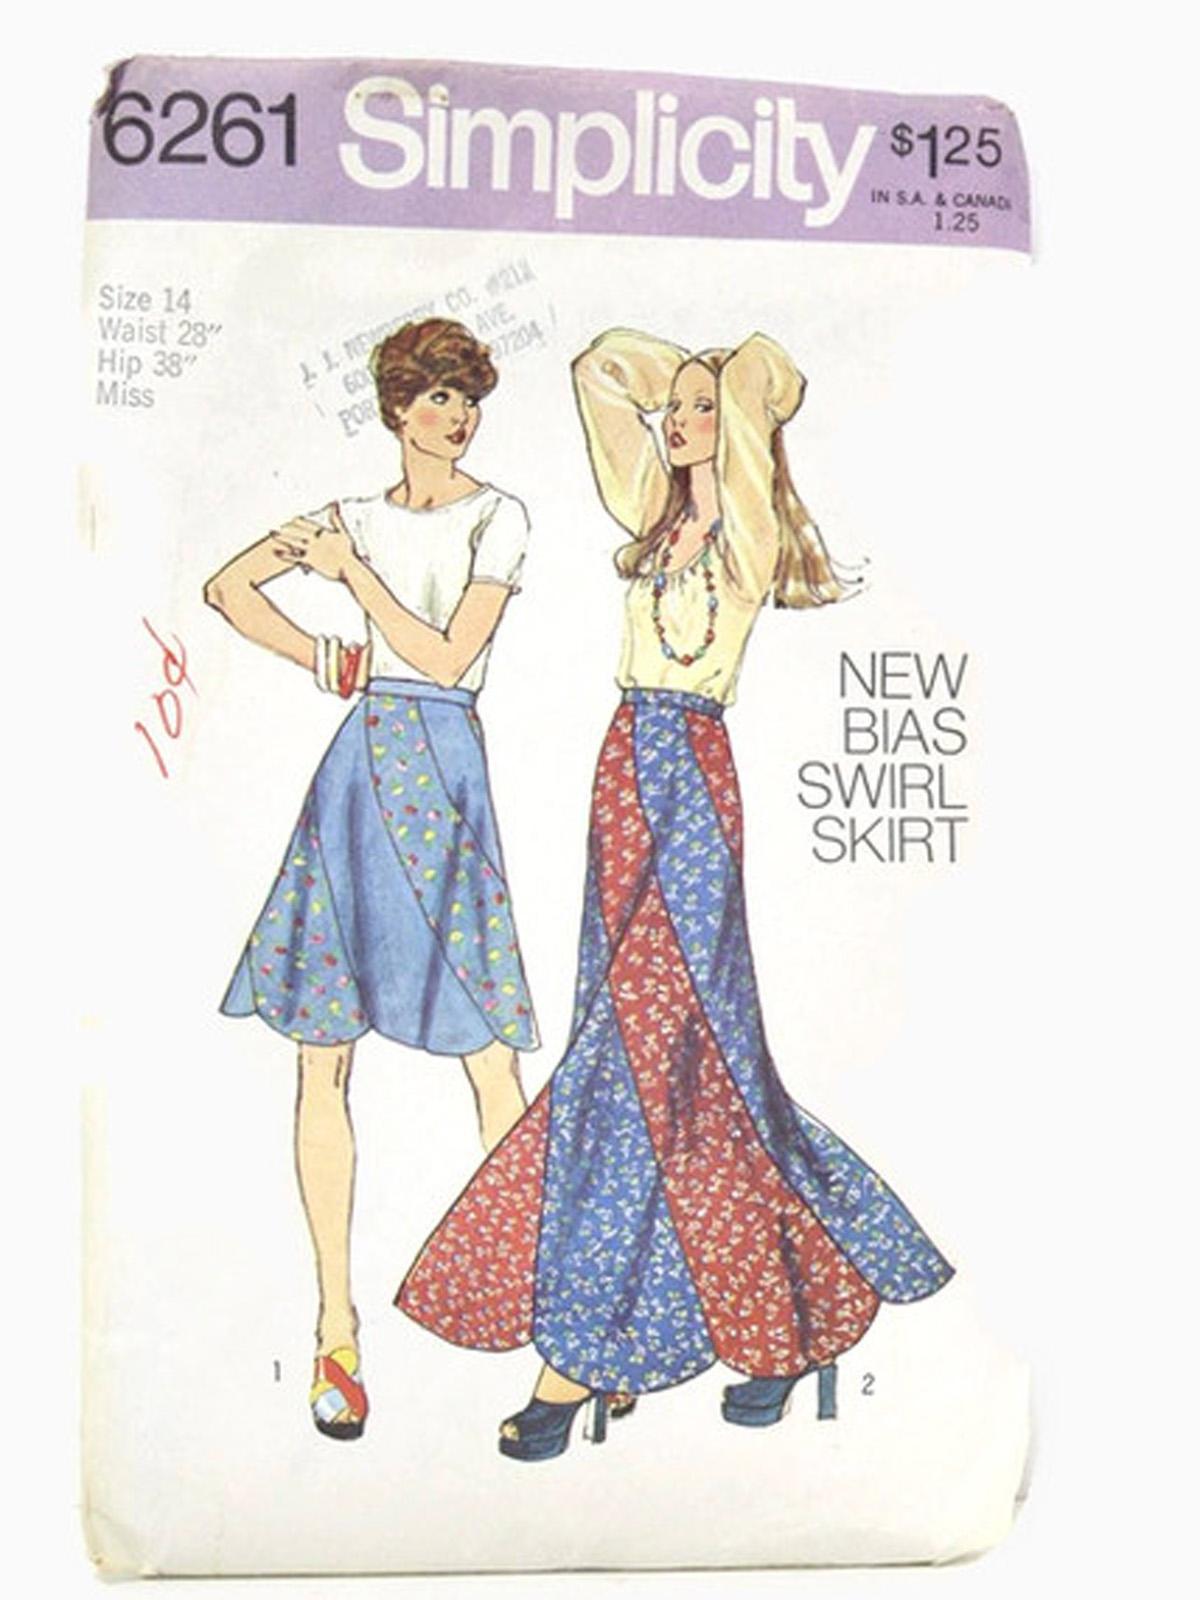 Swirl Skirt Pattern Patterns Gallery